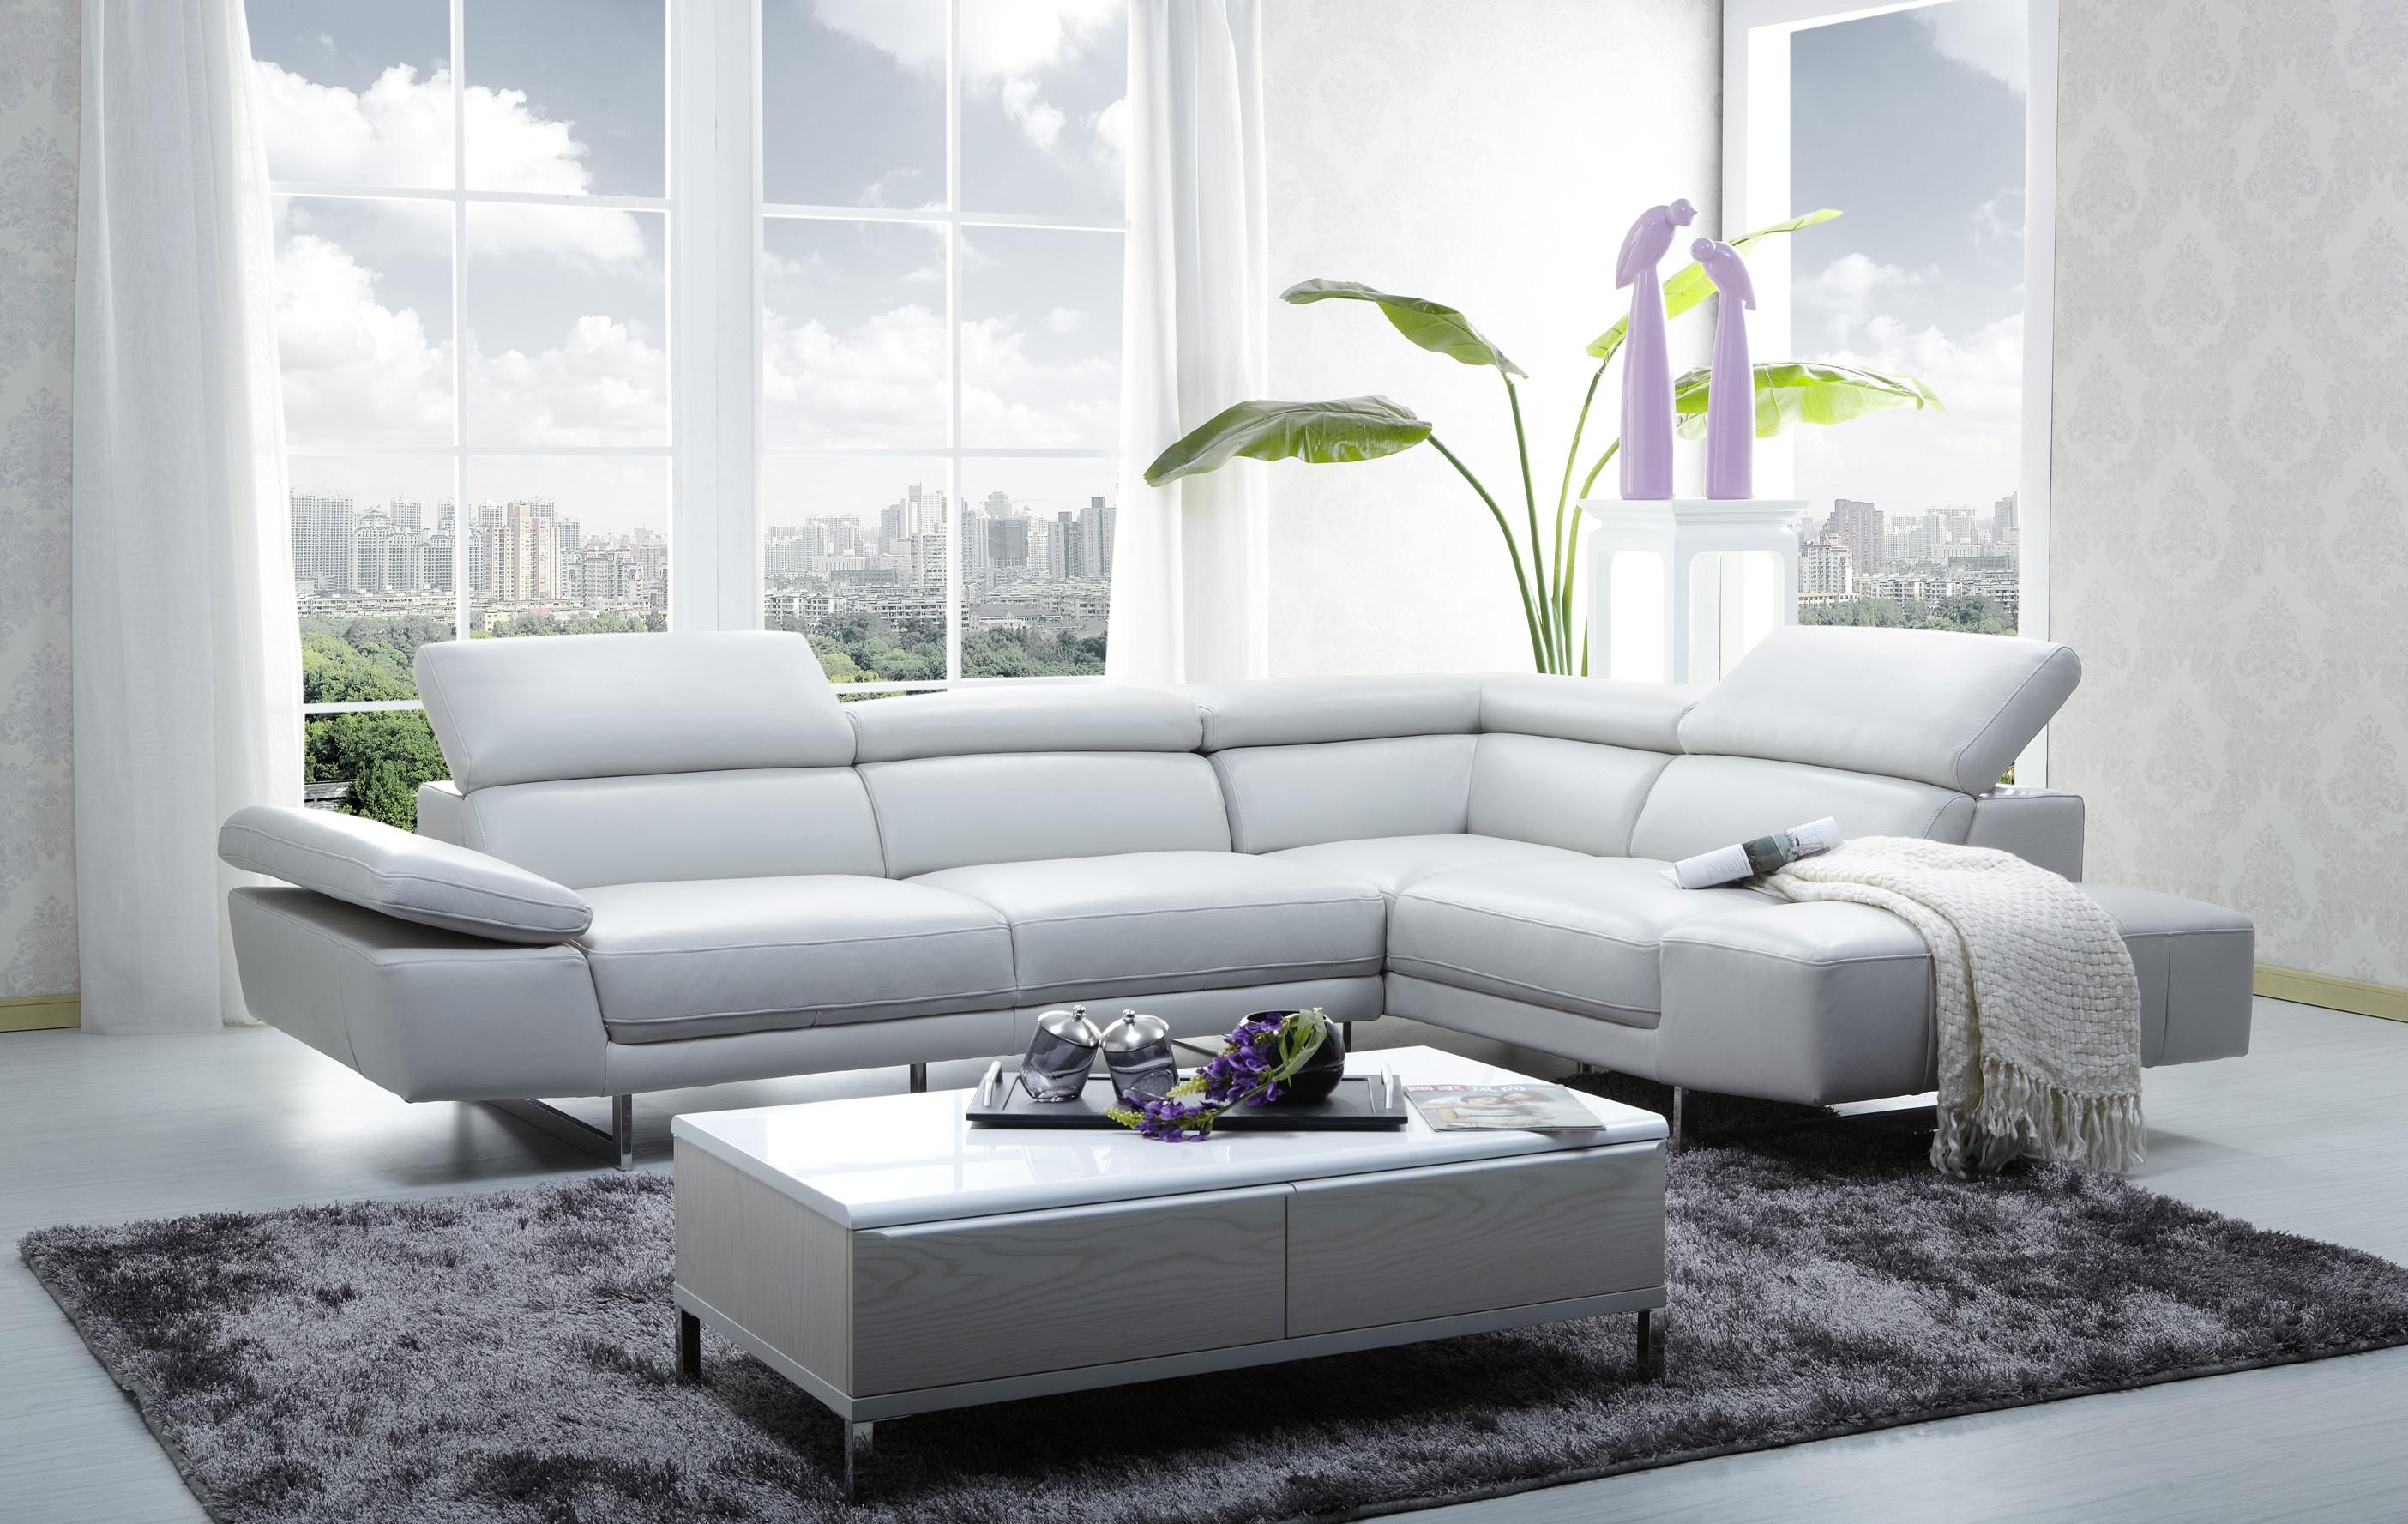 CADO Modern Furniture - 1717 Italian Leather Modern Sectional Sofa